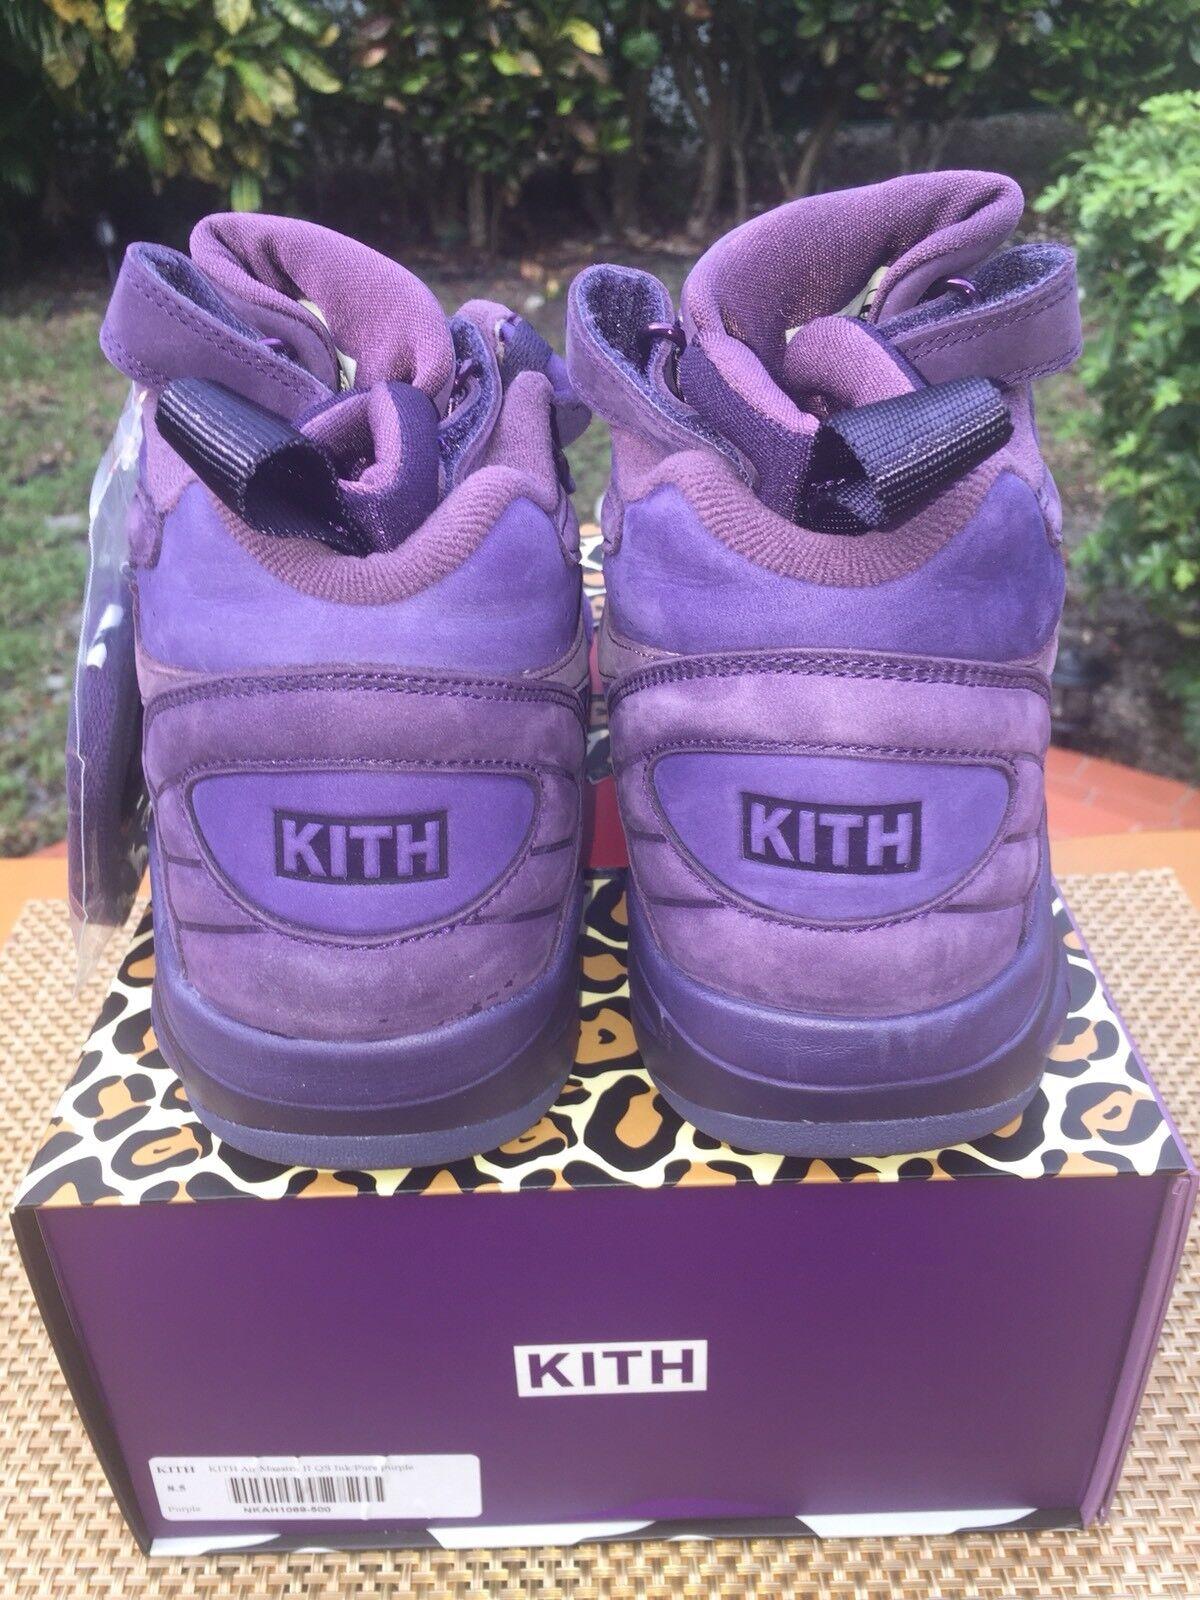 new concept c9e77 2337b ... Kith x Nike Nike Nike Air Maestro II QS Ink Pure Purple Pippen NKAH1069  500 Sz ...